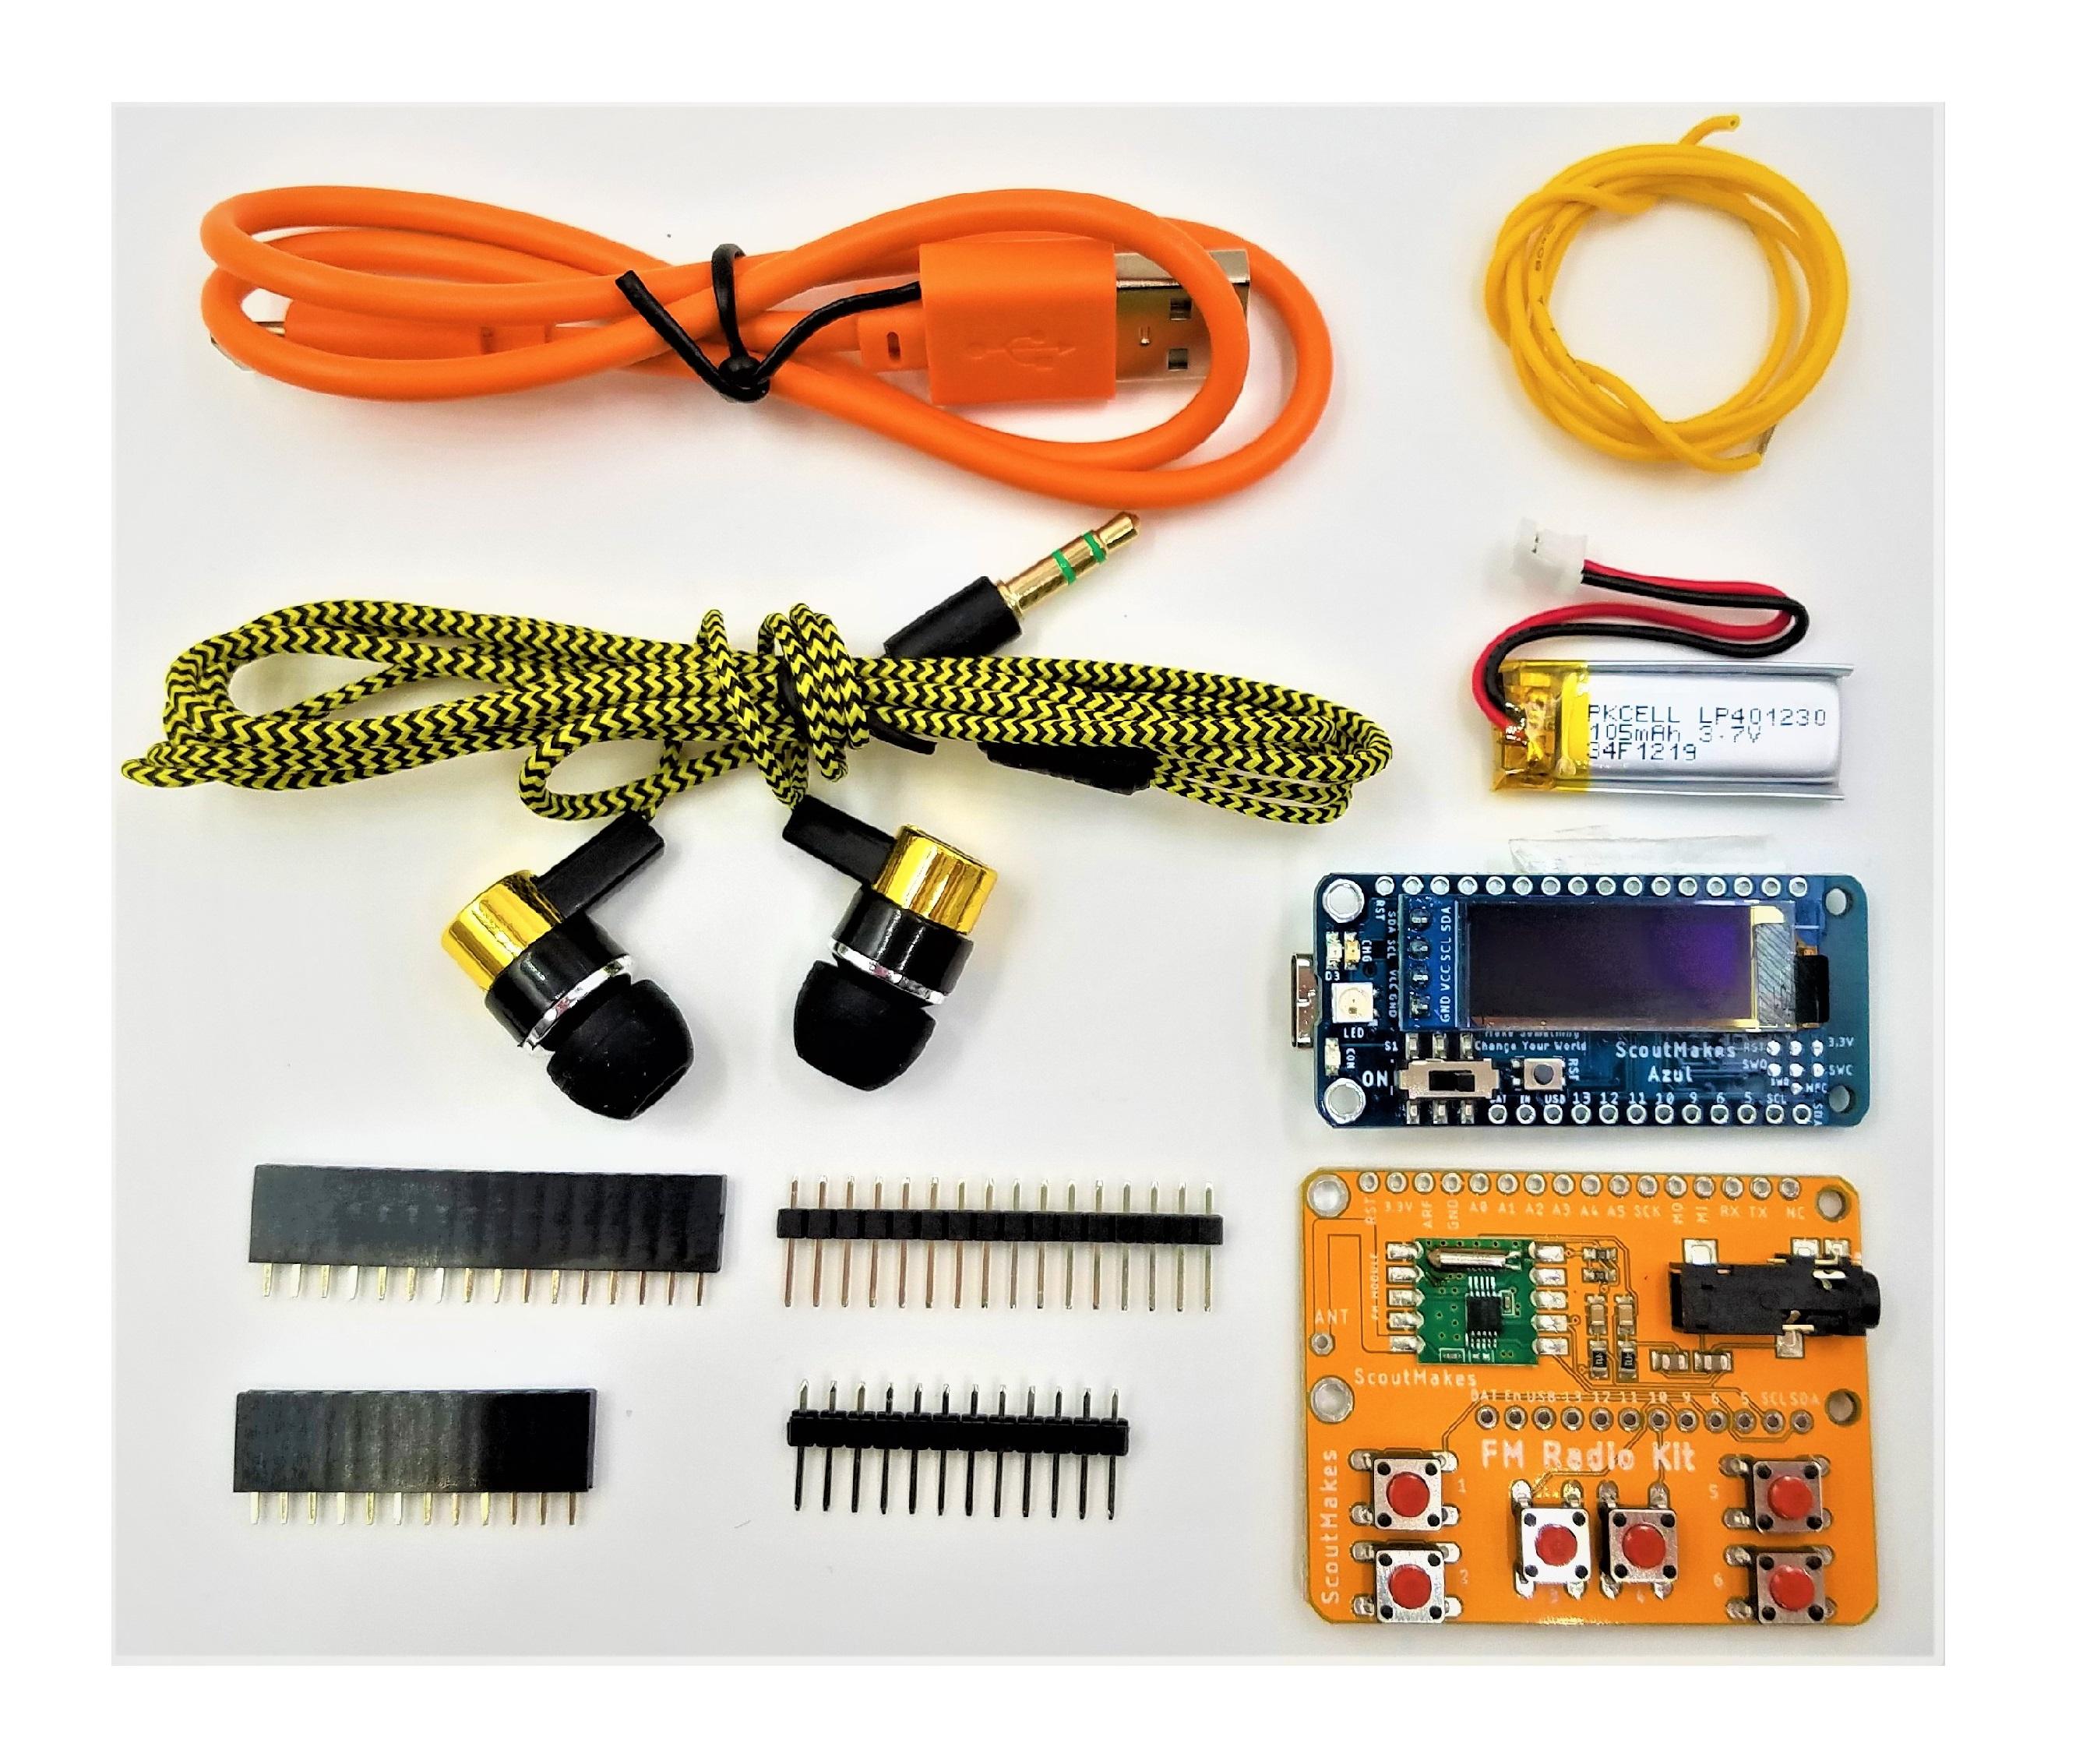 circuitpython_fm_kit_laidout2.jpg